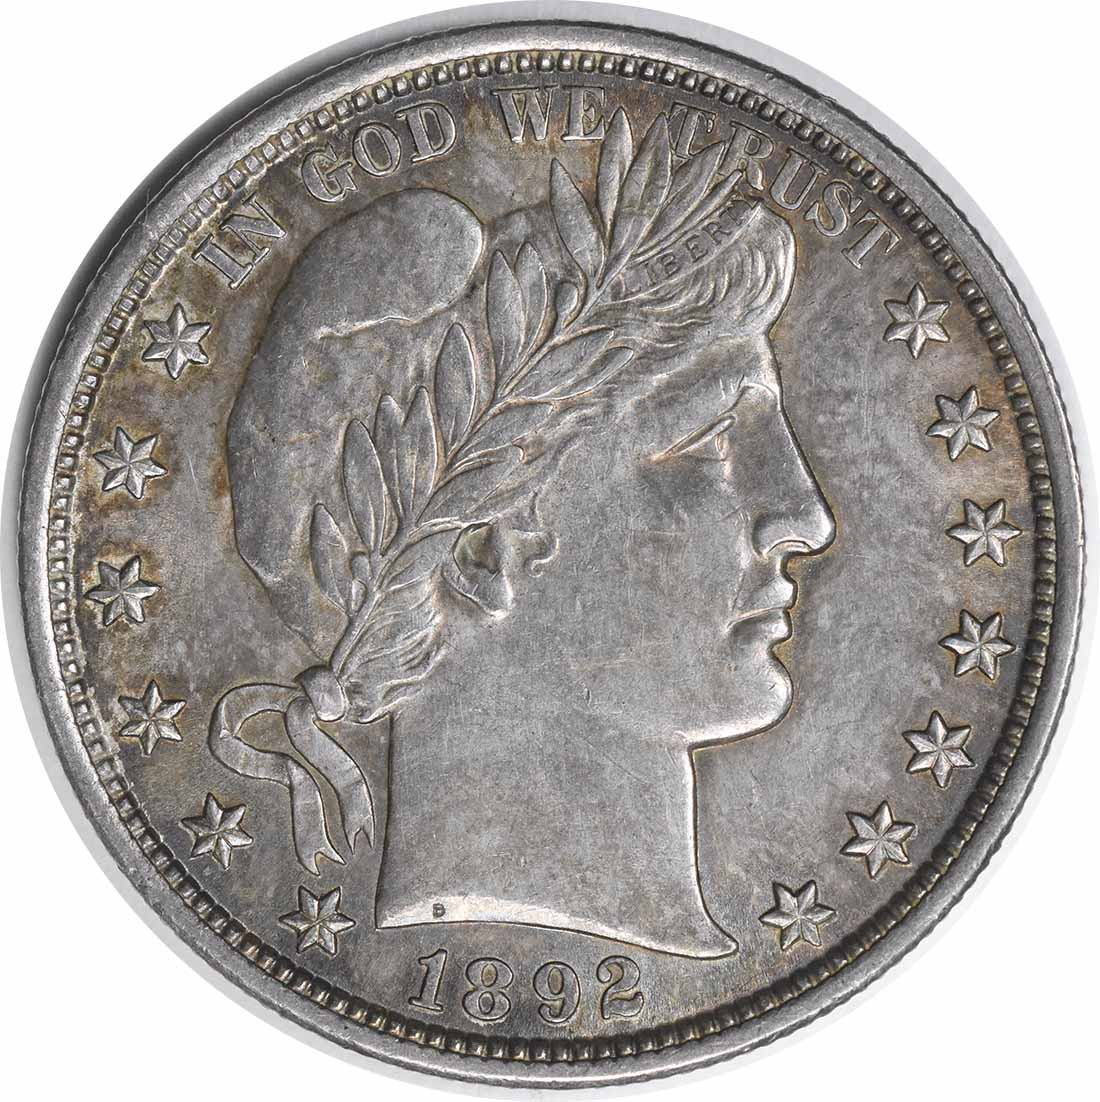 1892 Barber Silver Half Dollar AU58 Uncertified #1106